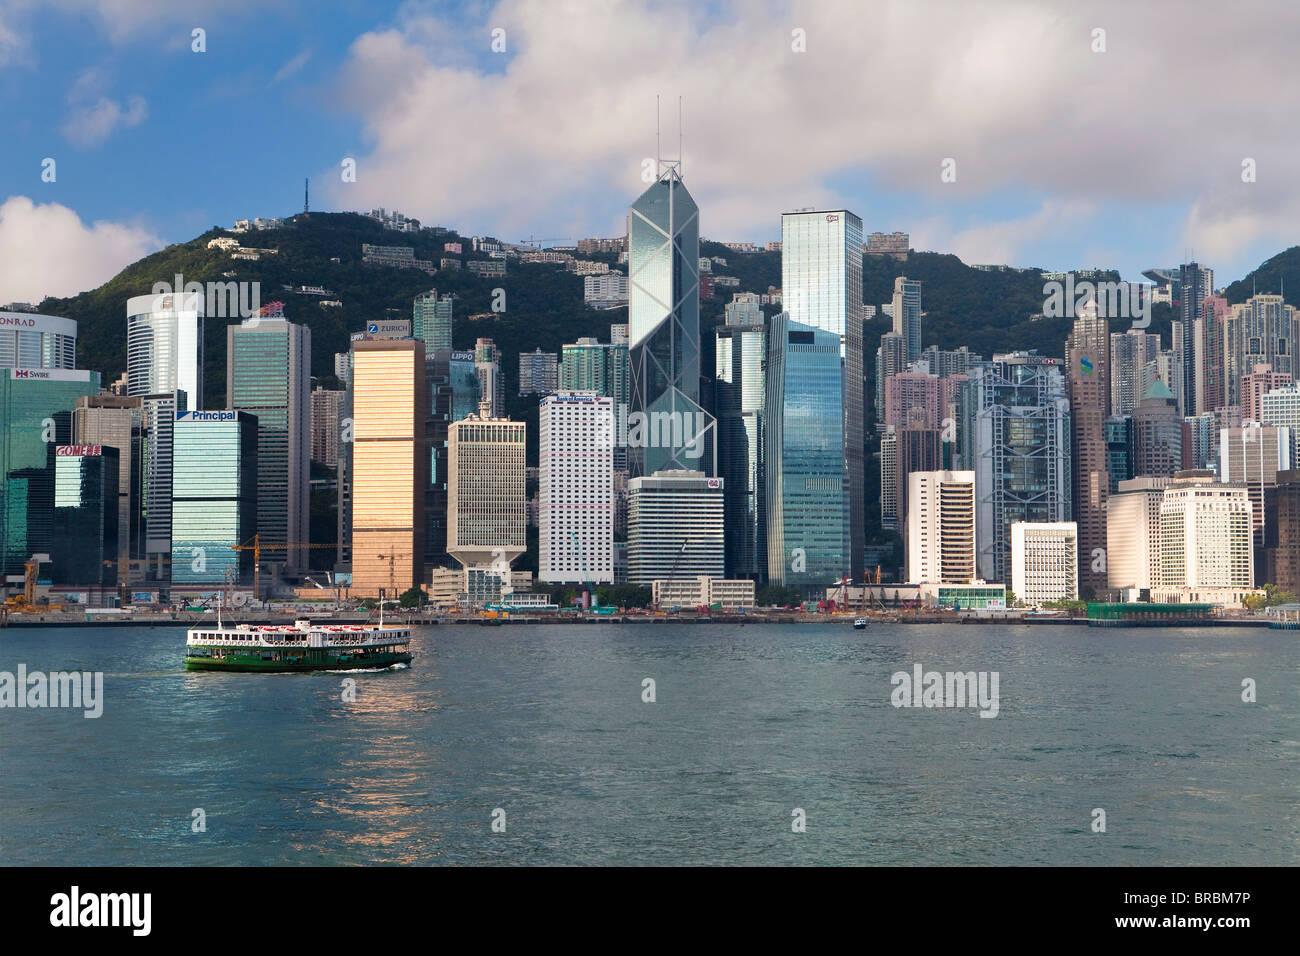 Horizonte de Central, la Isla de Hong Kong, desde el puerto de Victoria, Hong Kong, China Imagen De Stock